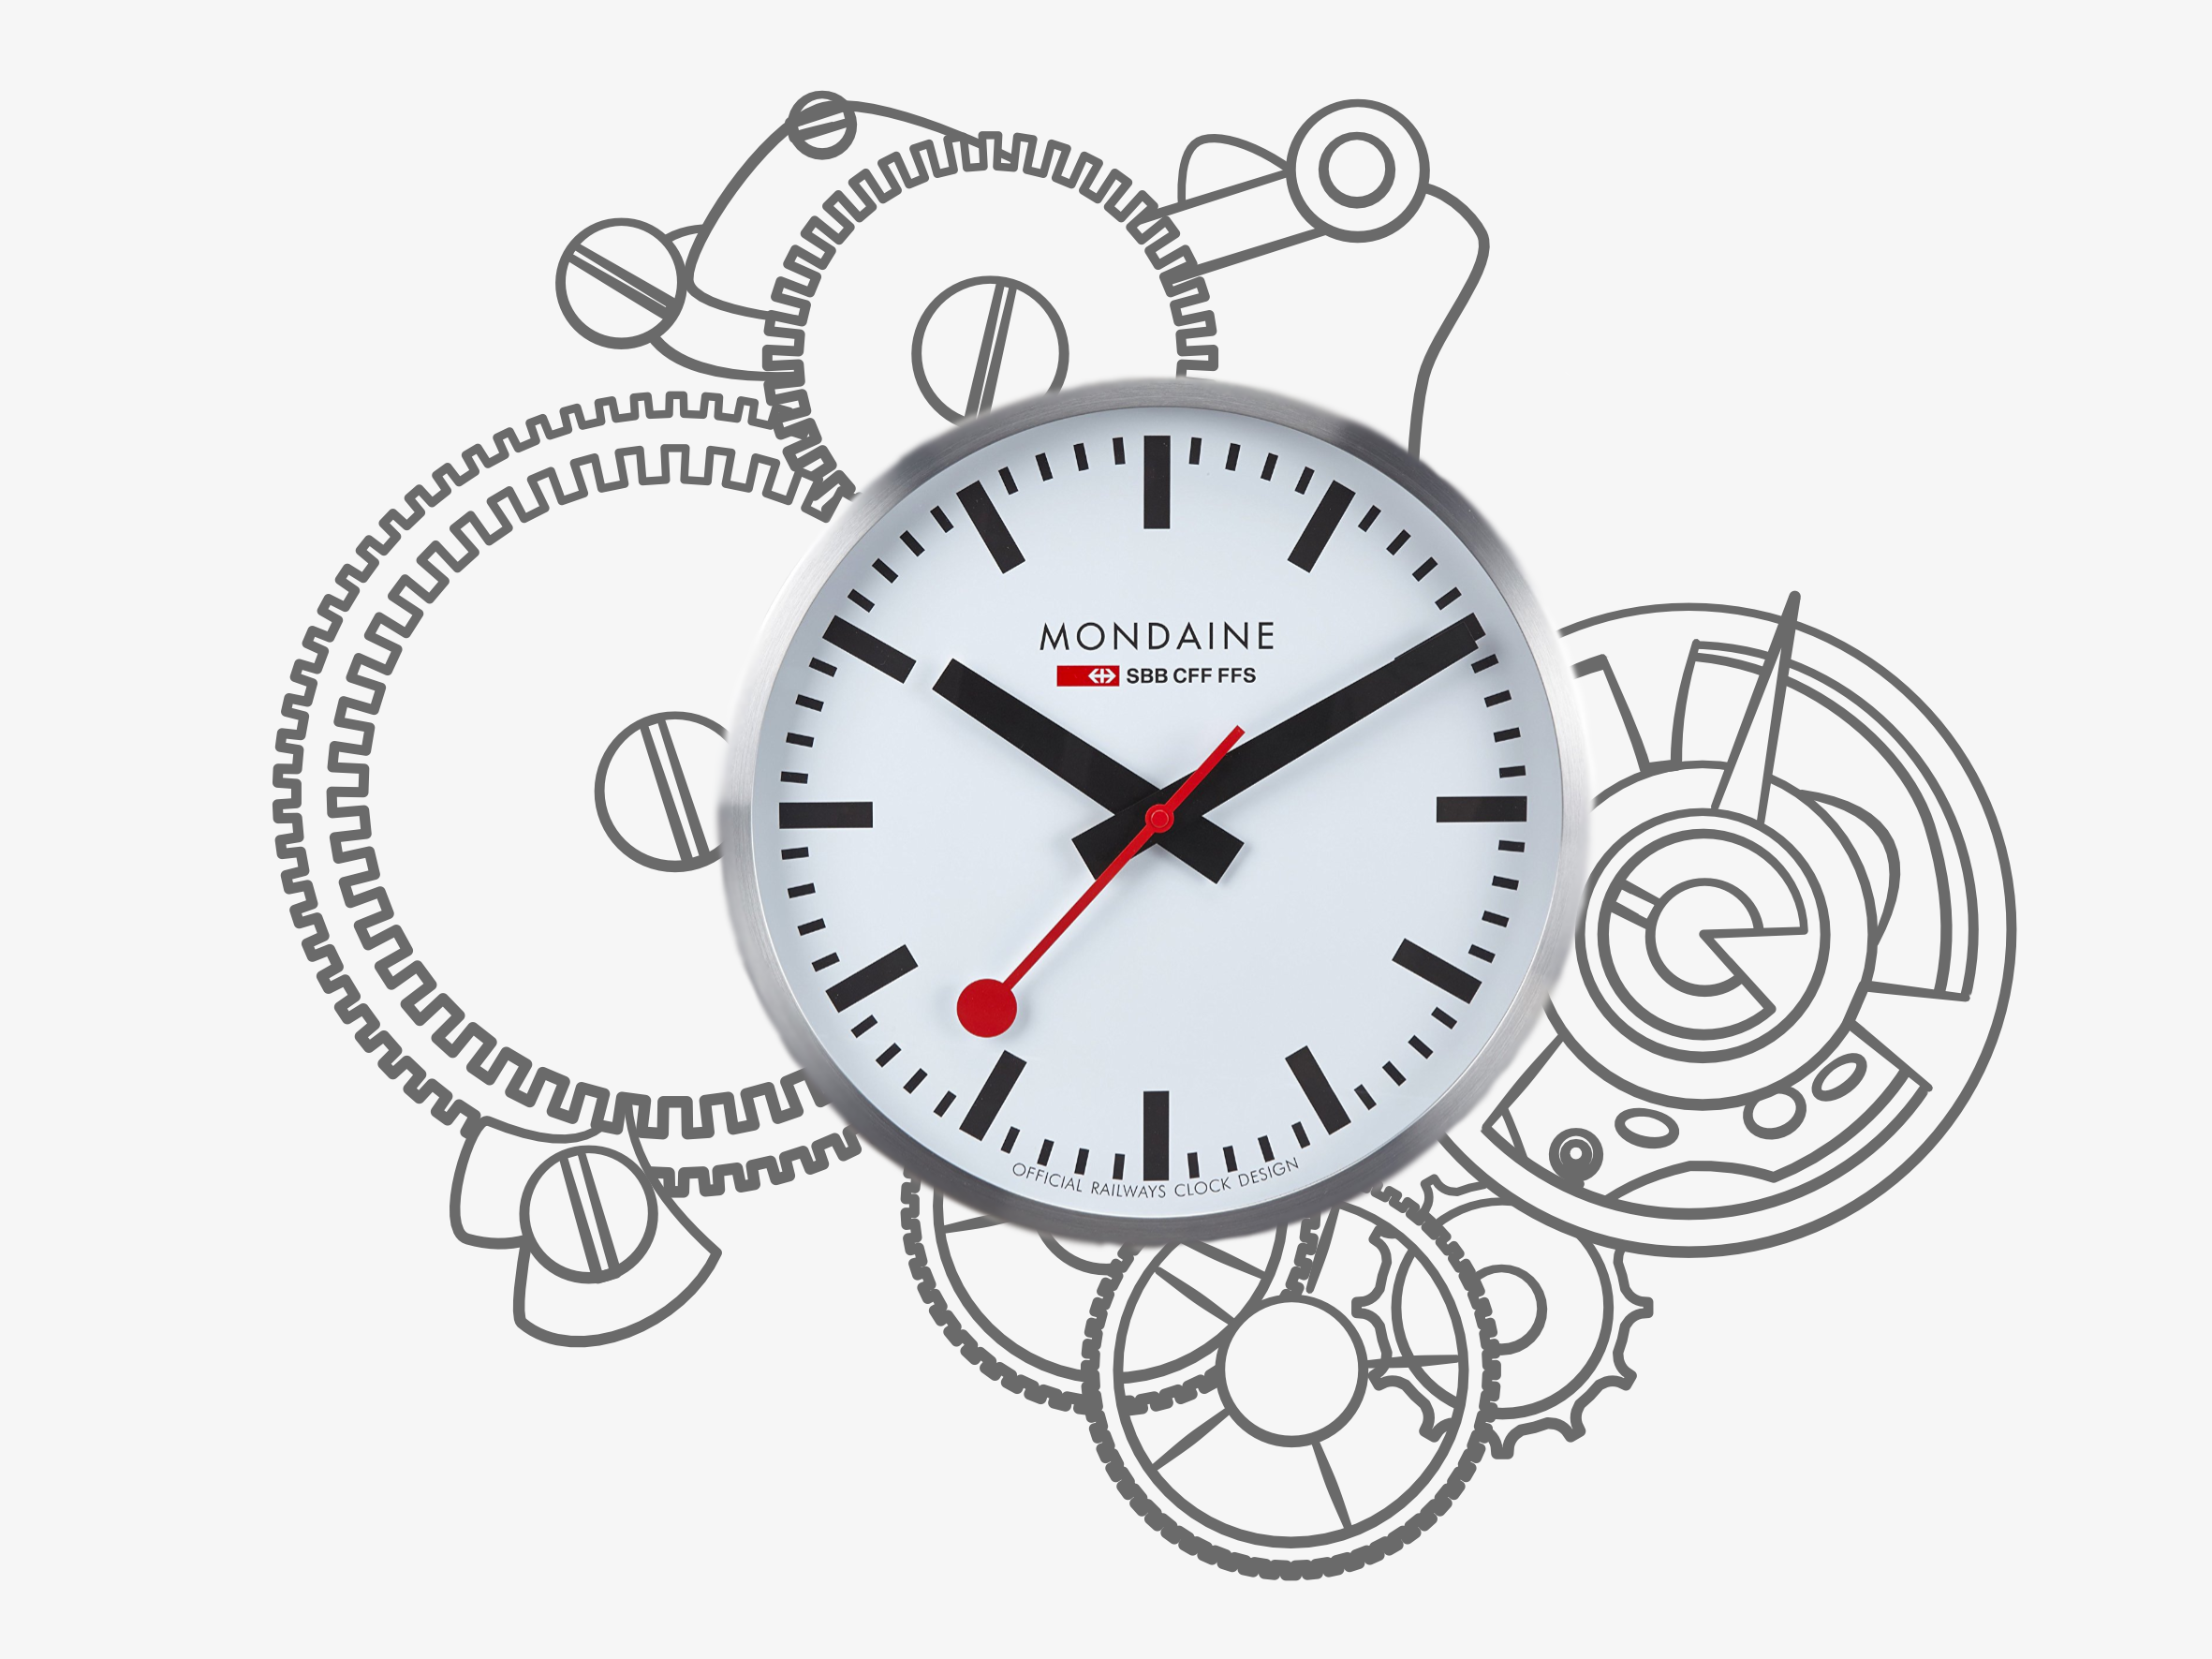 Mondaine swiss railway clock design history